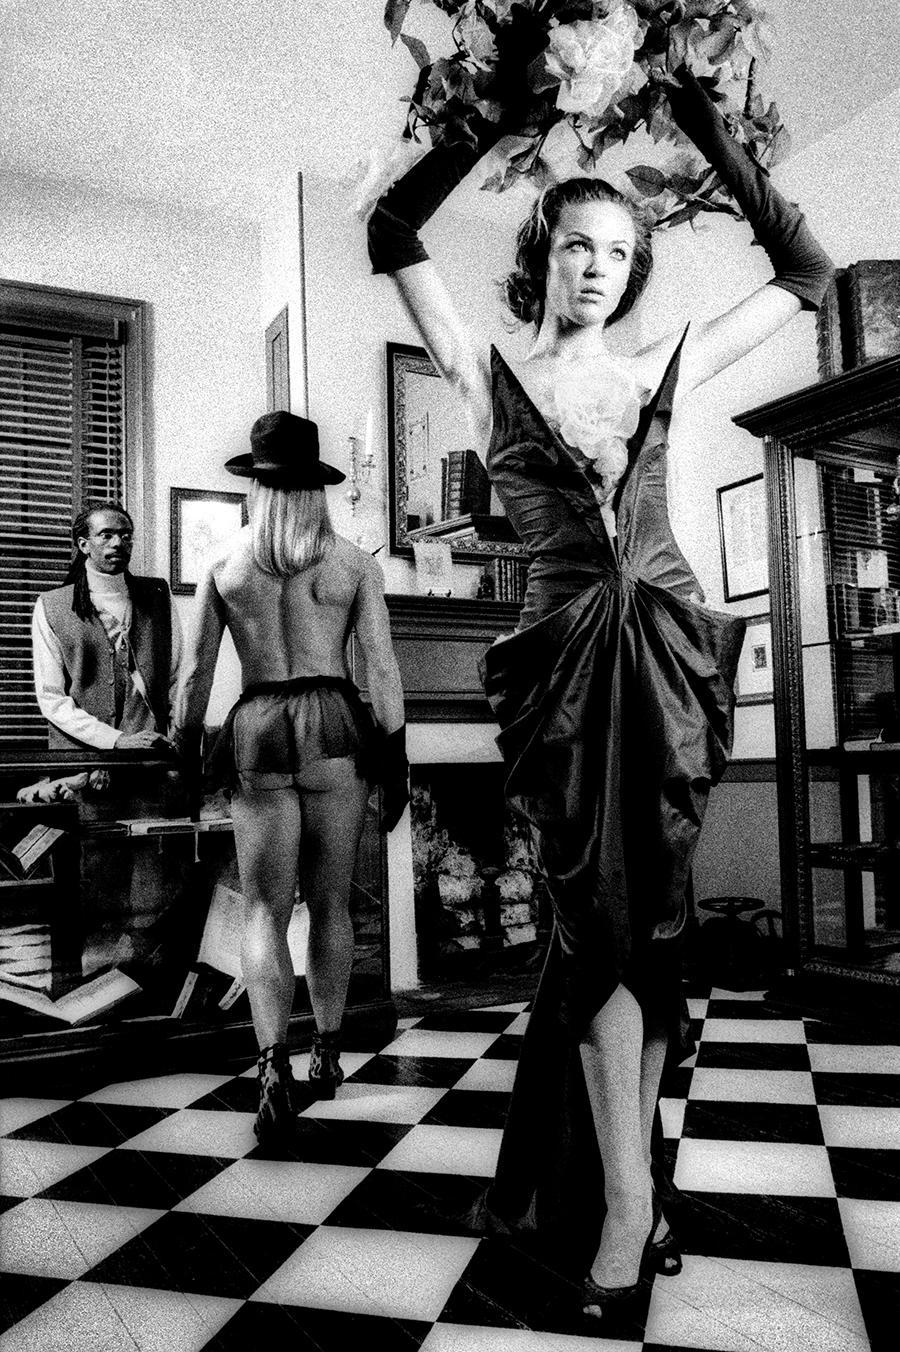 Tony_Ward_studio_tableaux_vivants_holly_dressed